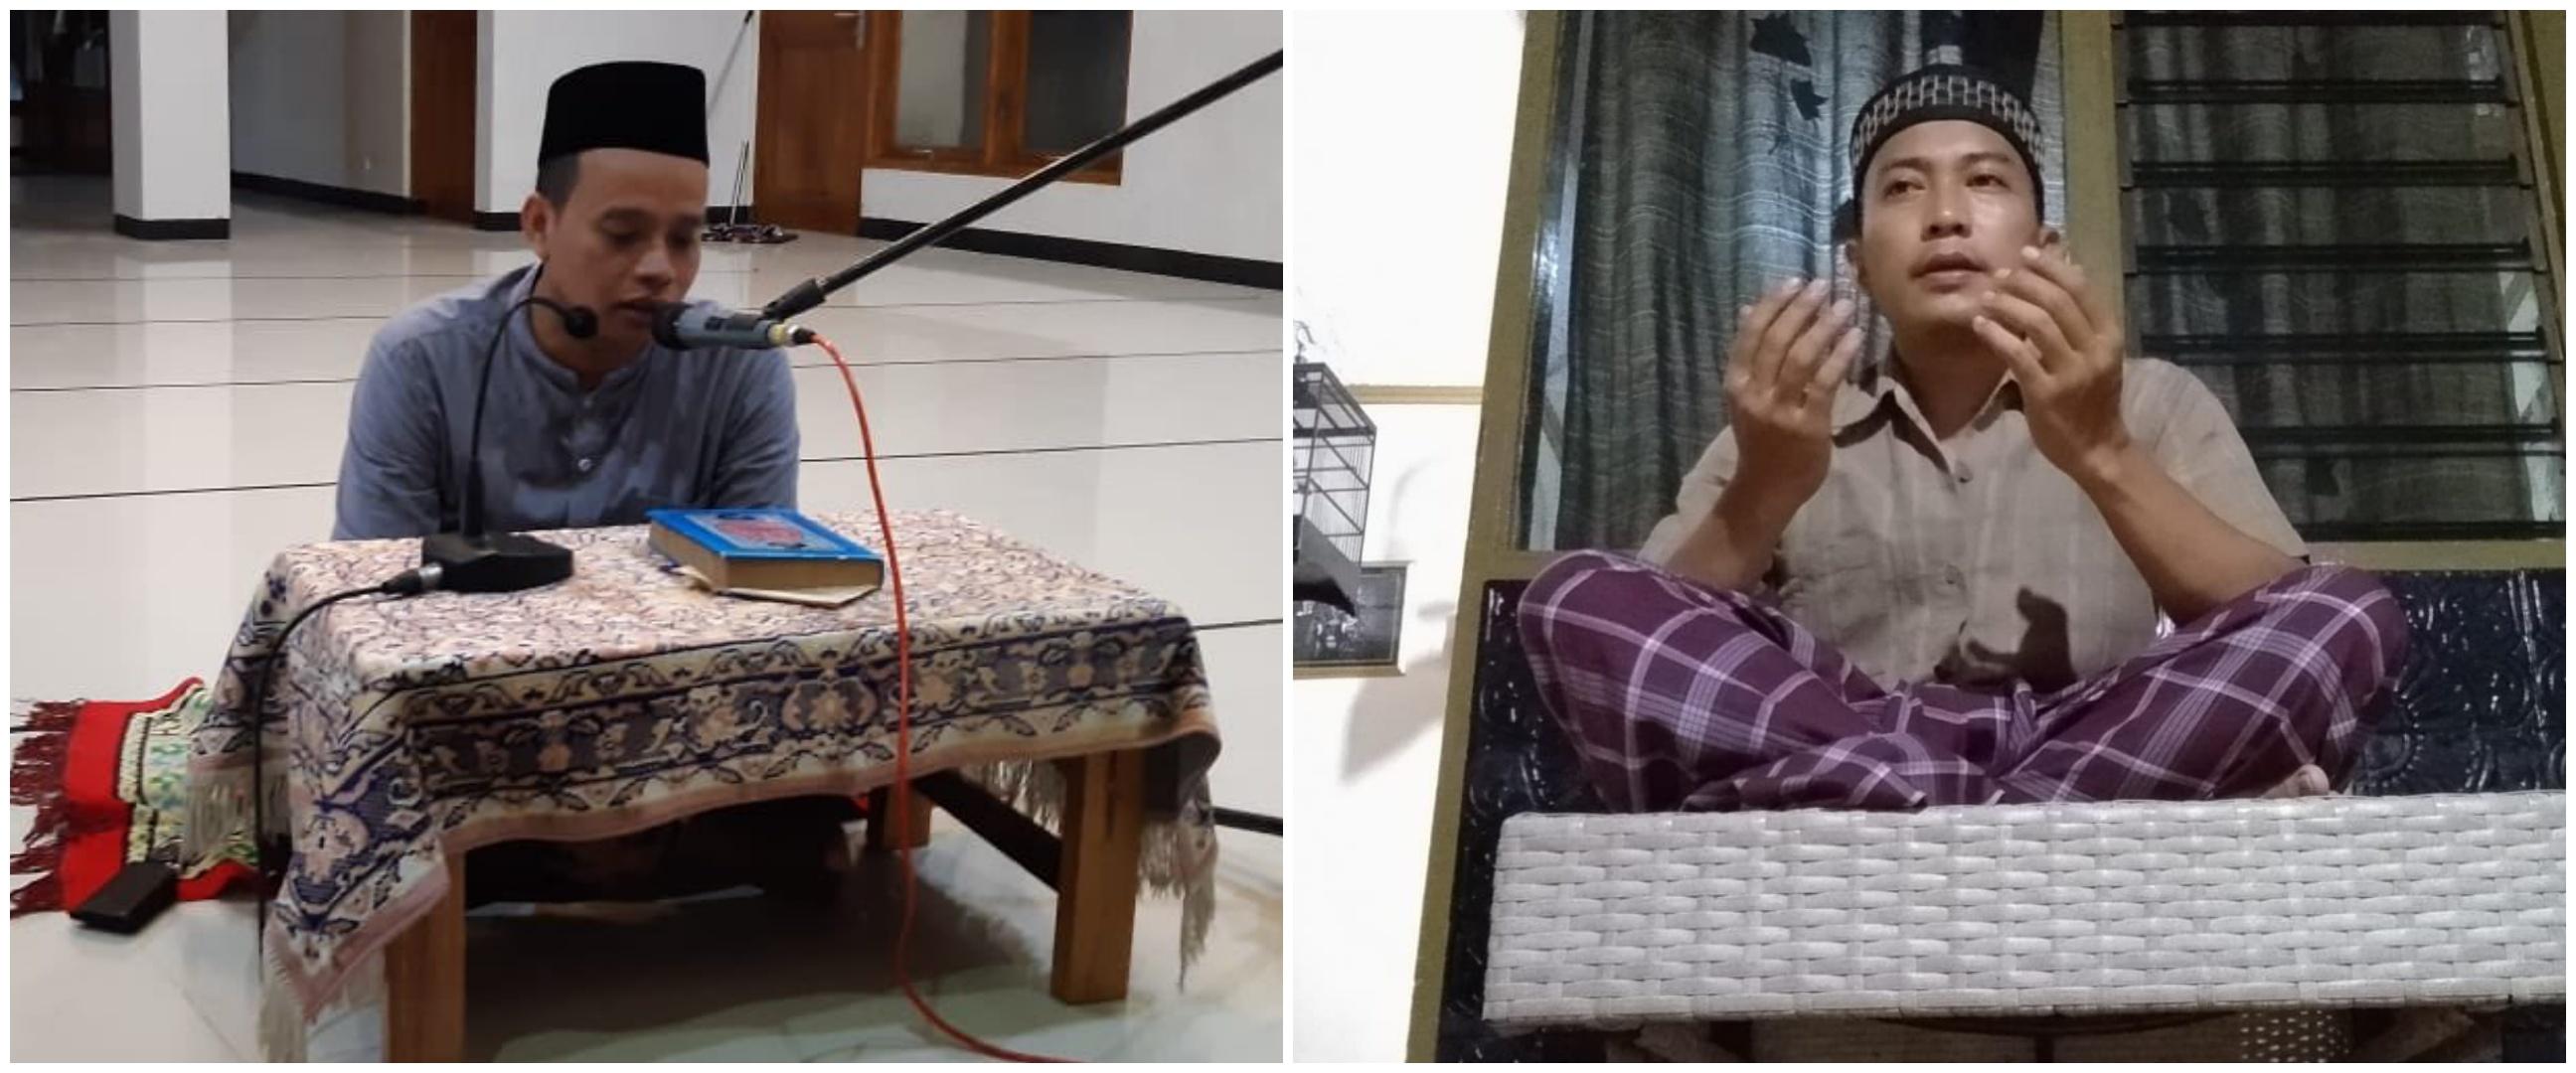 Viral potret physical distancing warga saat tahlilan, cegah corona